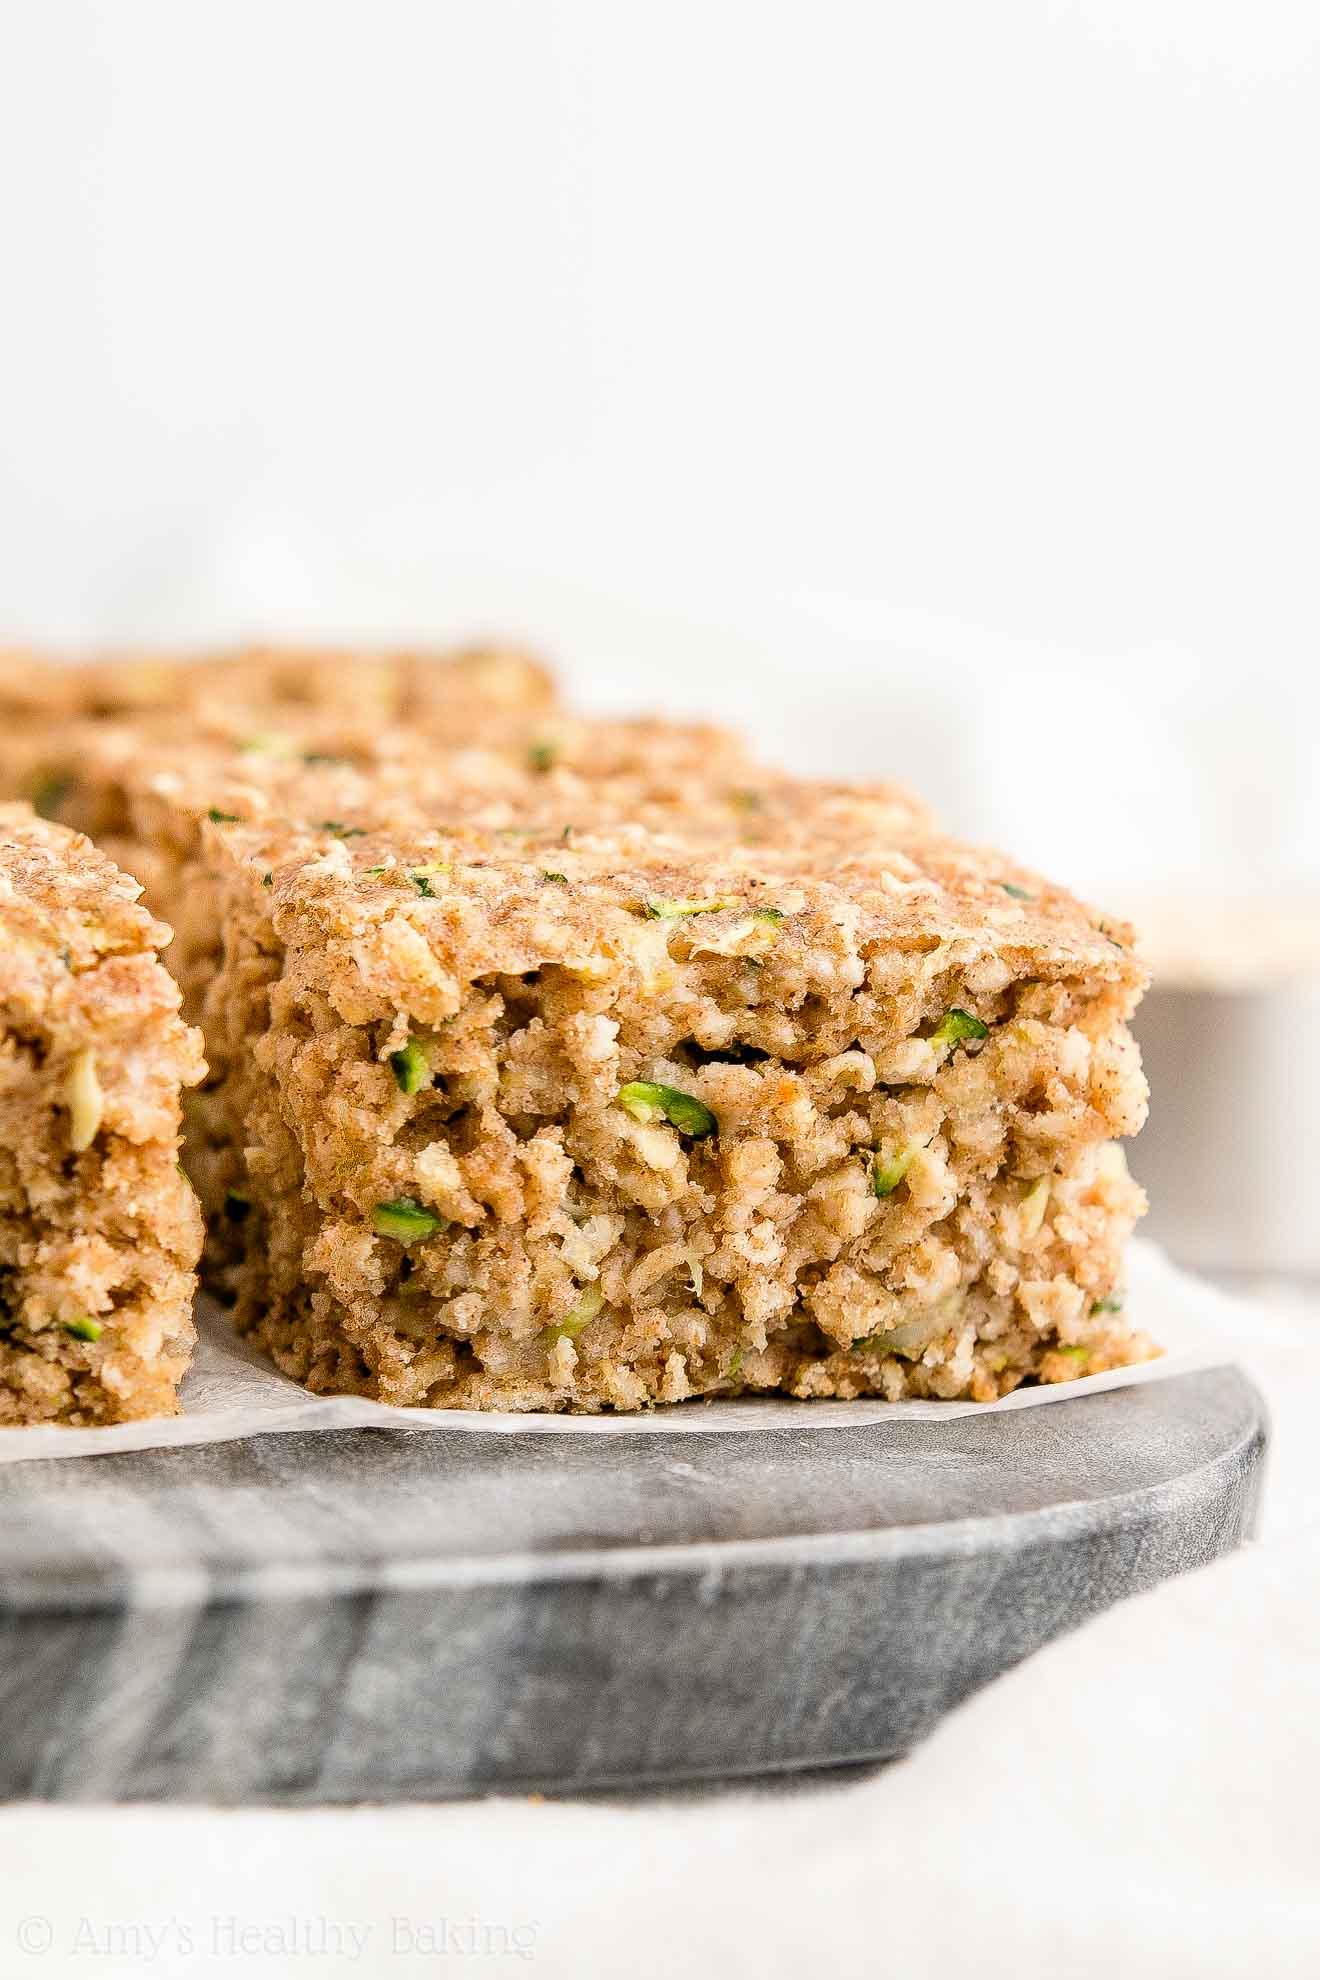 Healthy Zucchini Oatmeal Snack Cake Amy S Healthy Baking